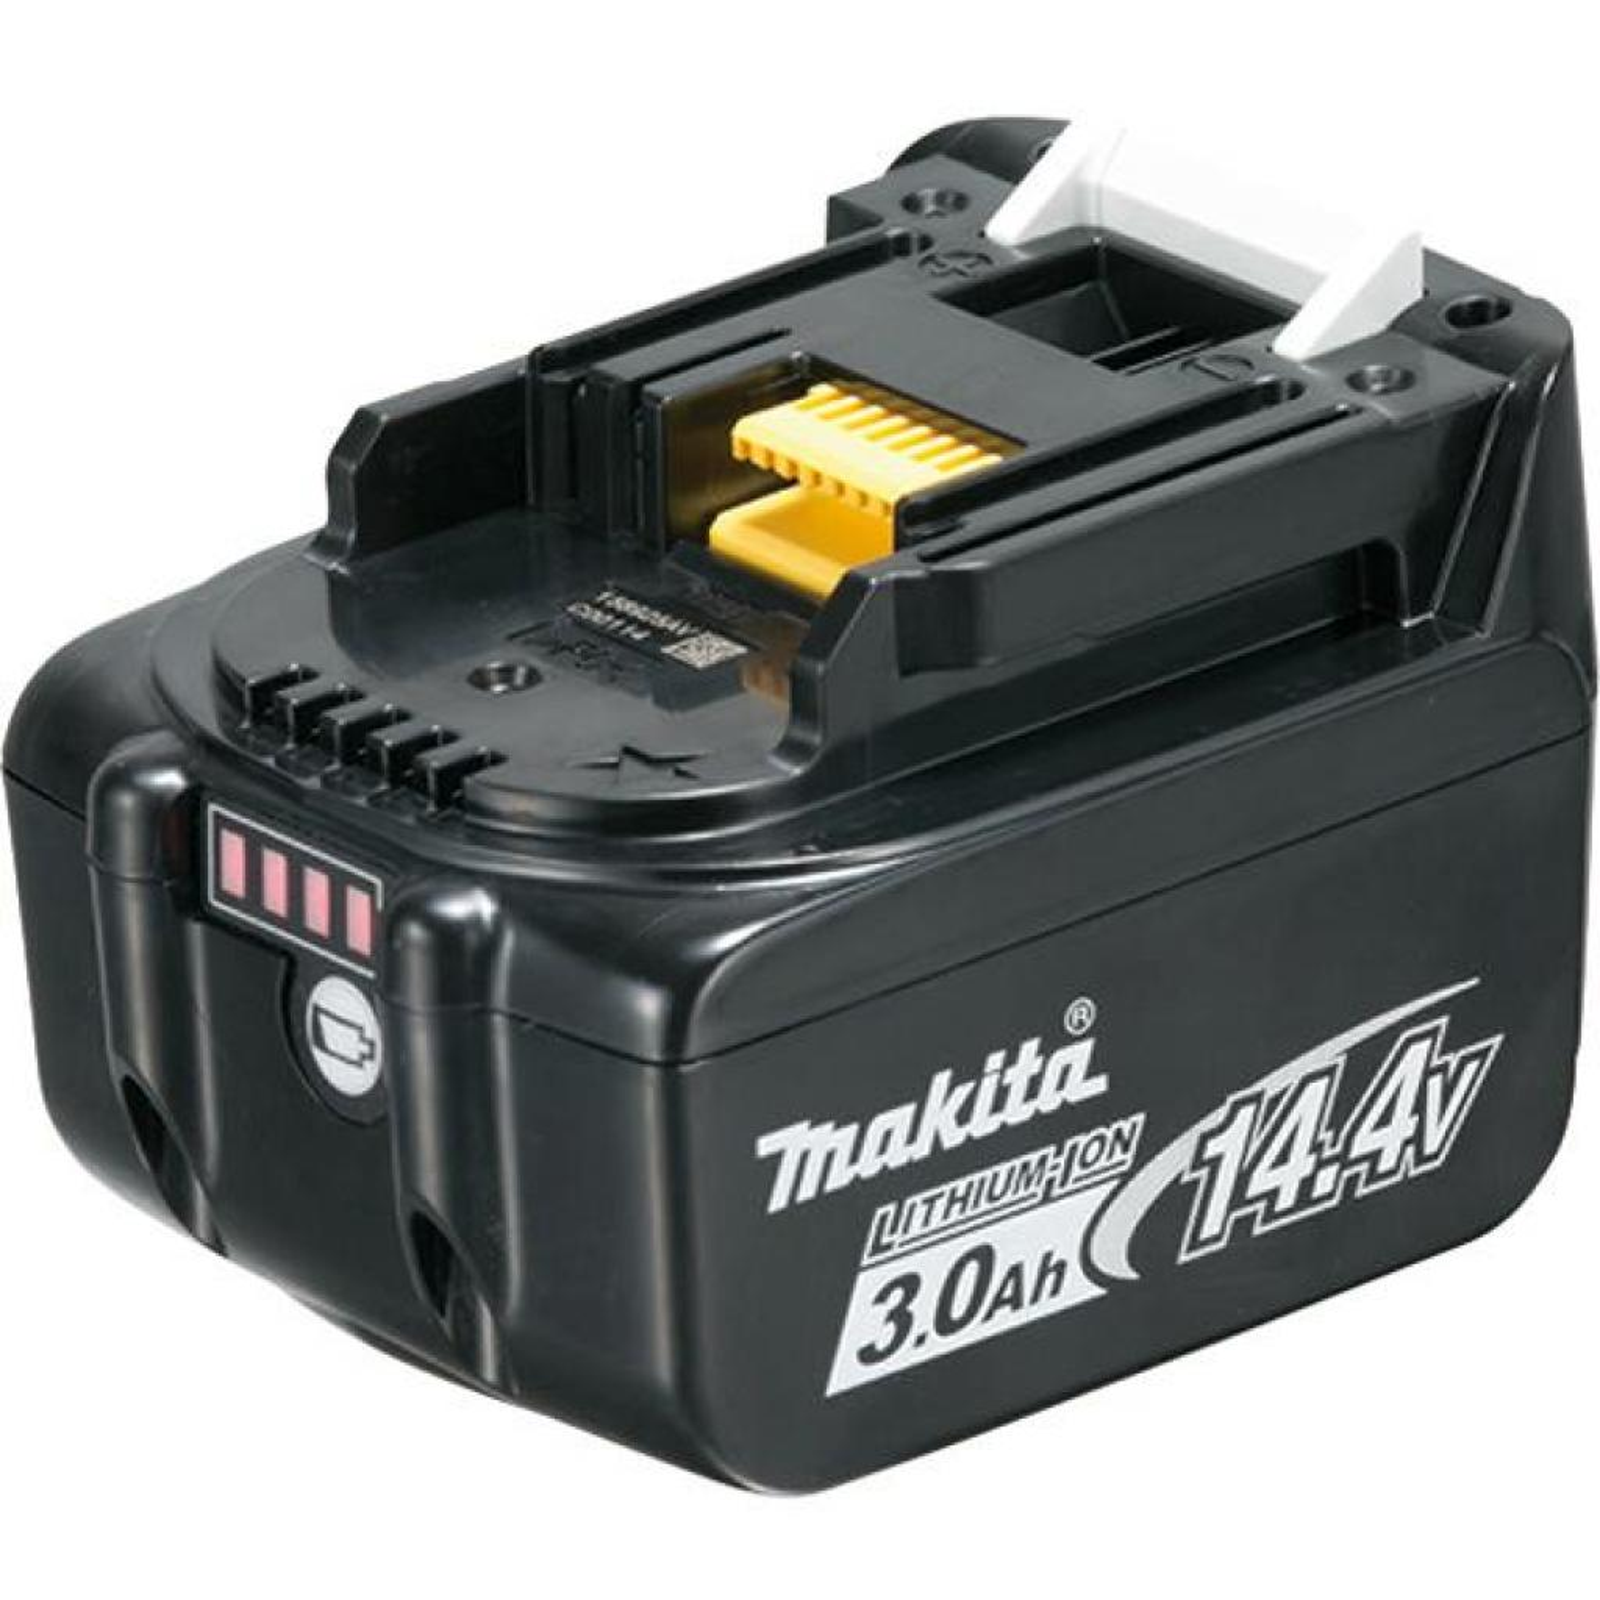 Аккумулятор к электроинструменту Makita BL1430B (Li-Ion, 14В, 3Ач, индикация заряда) (632G20-4)